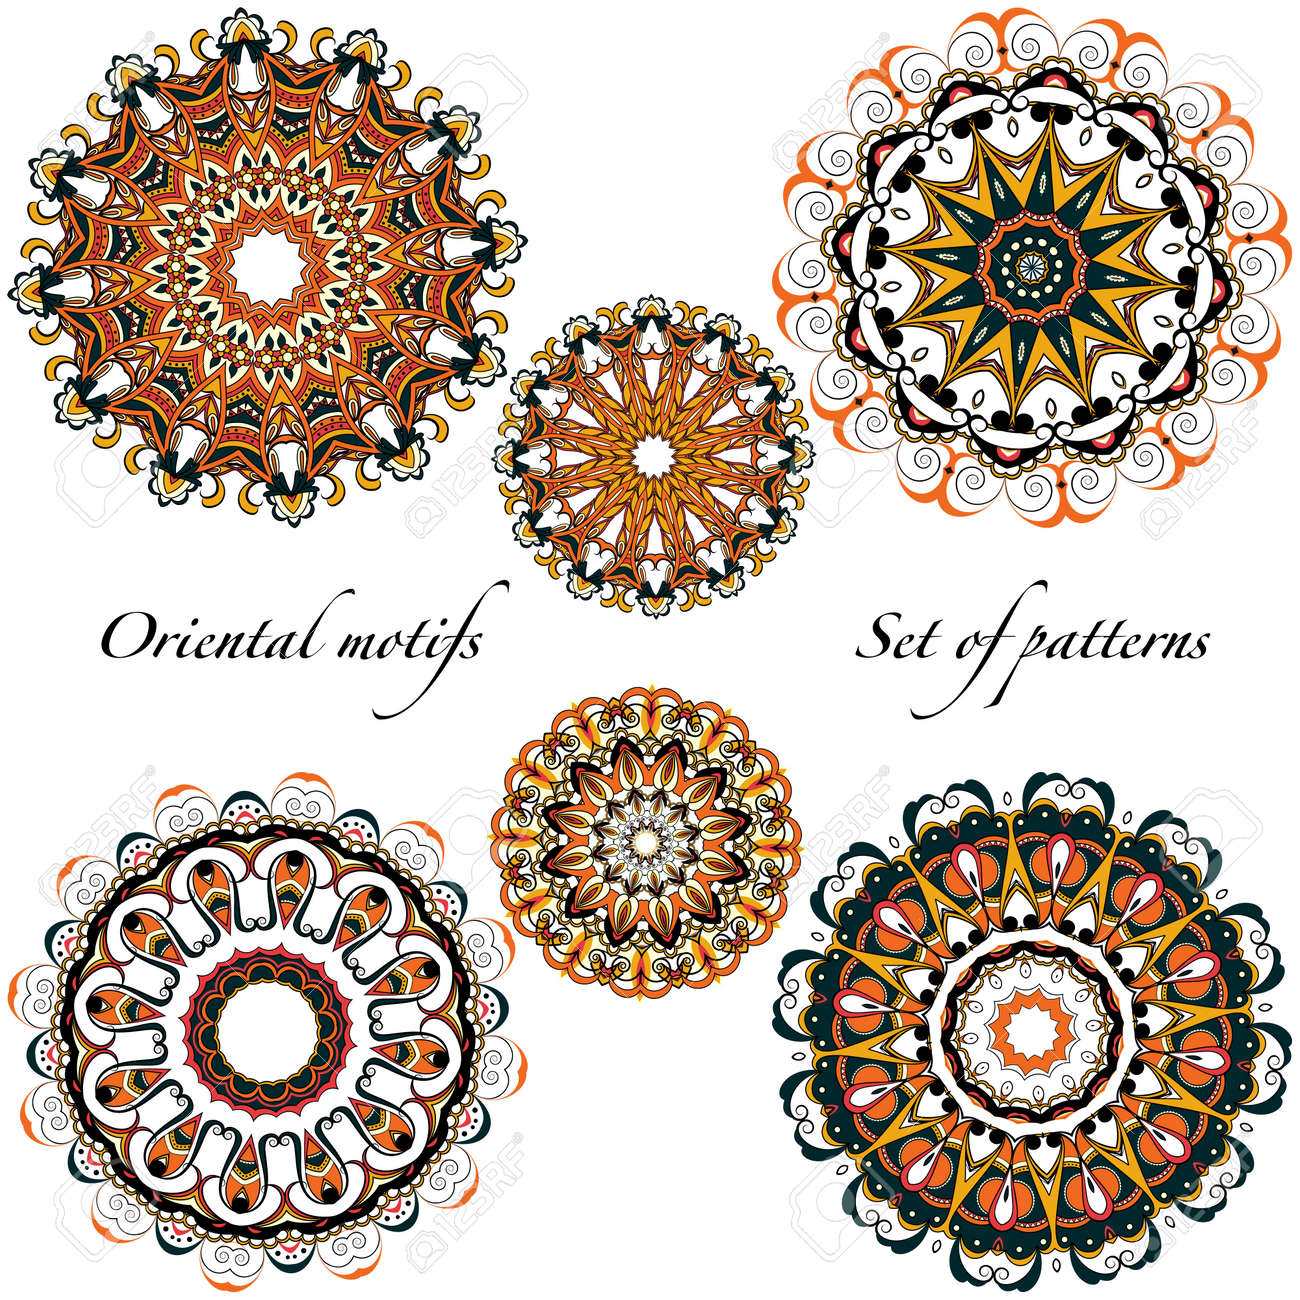 Oriental motifs, mandalas in a warm - 159893538